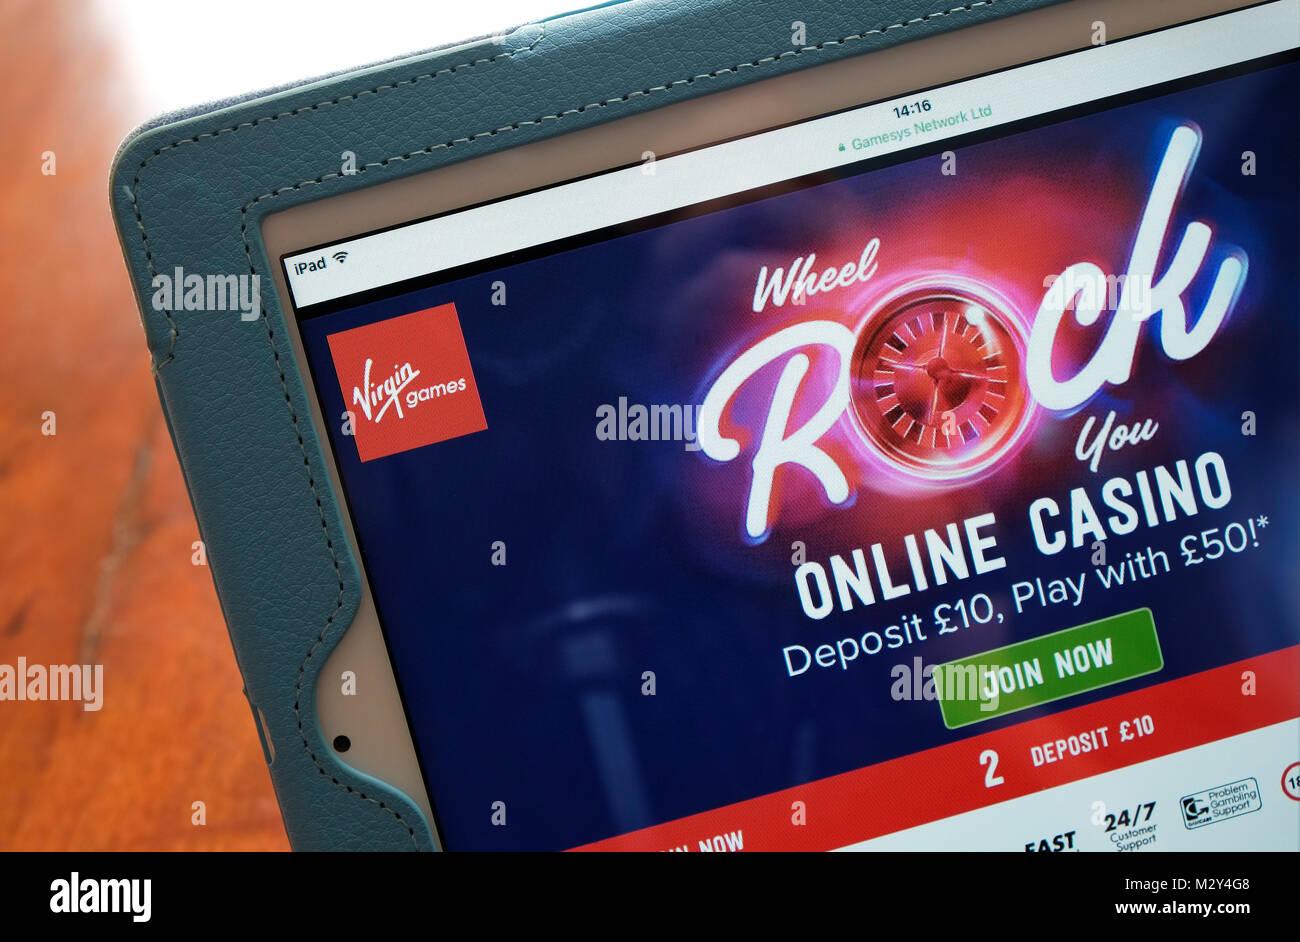 online casino g